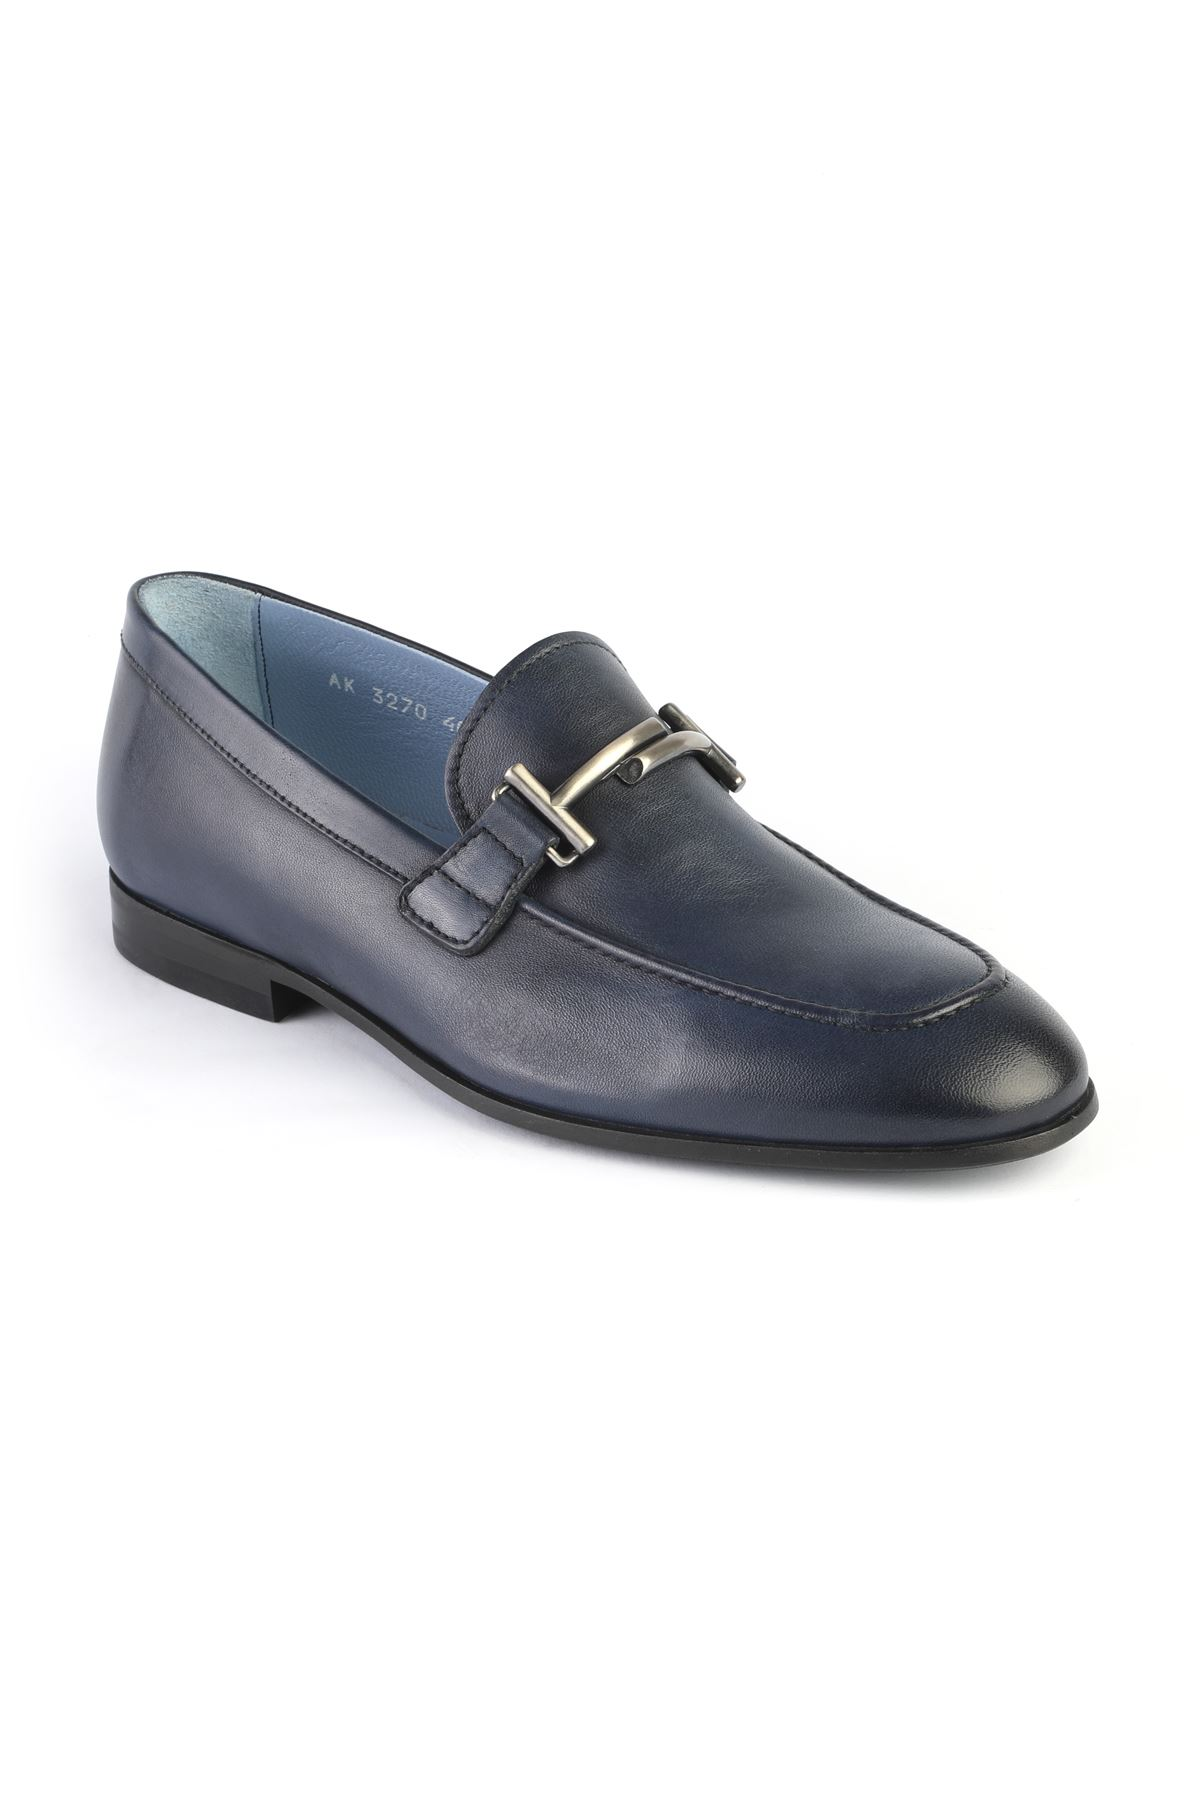 Libero 3270 Navy Blue Loafers